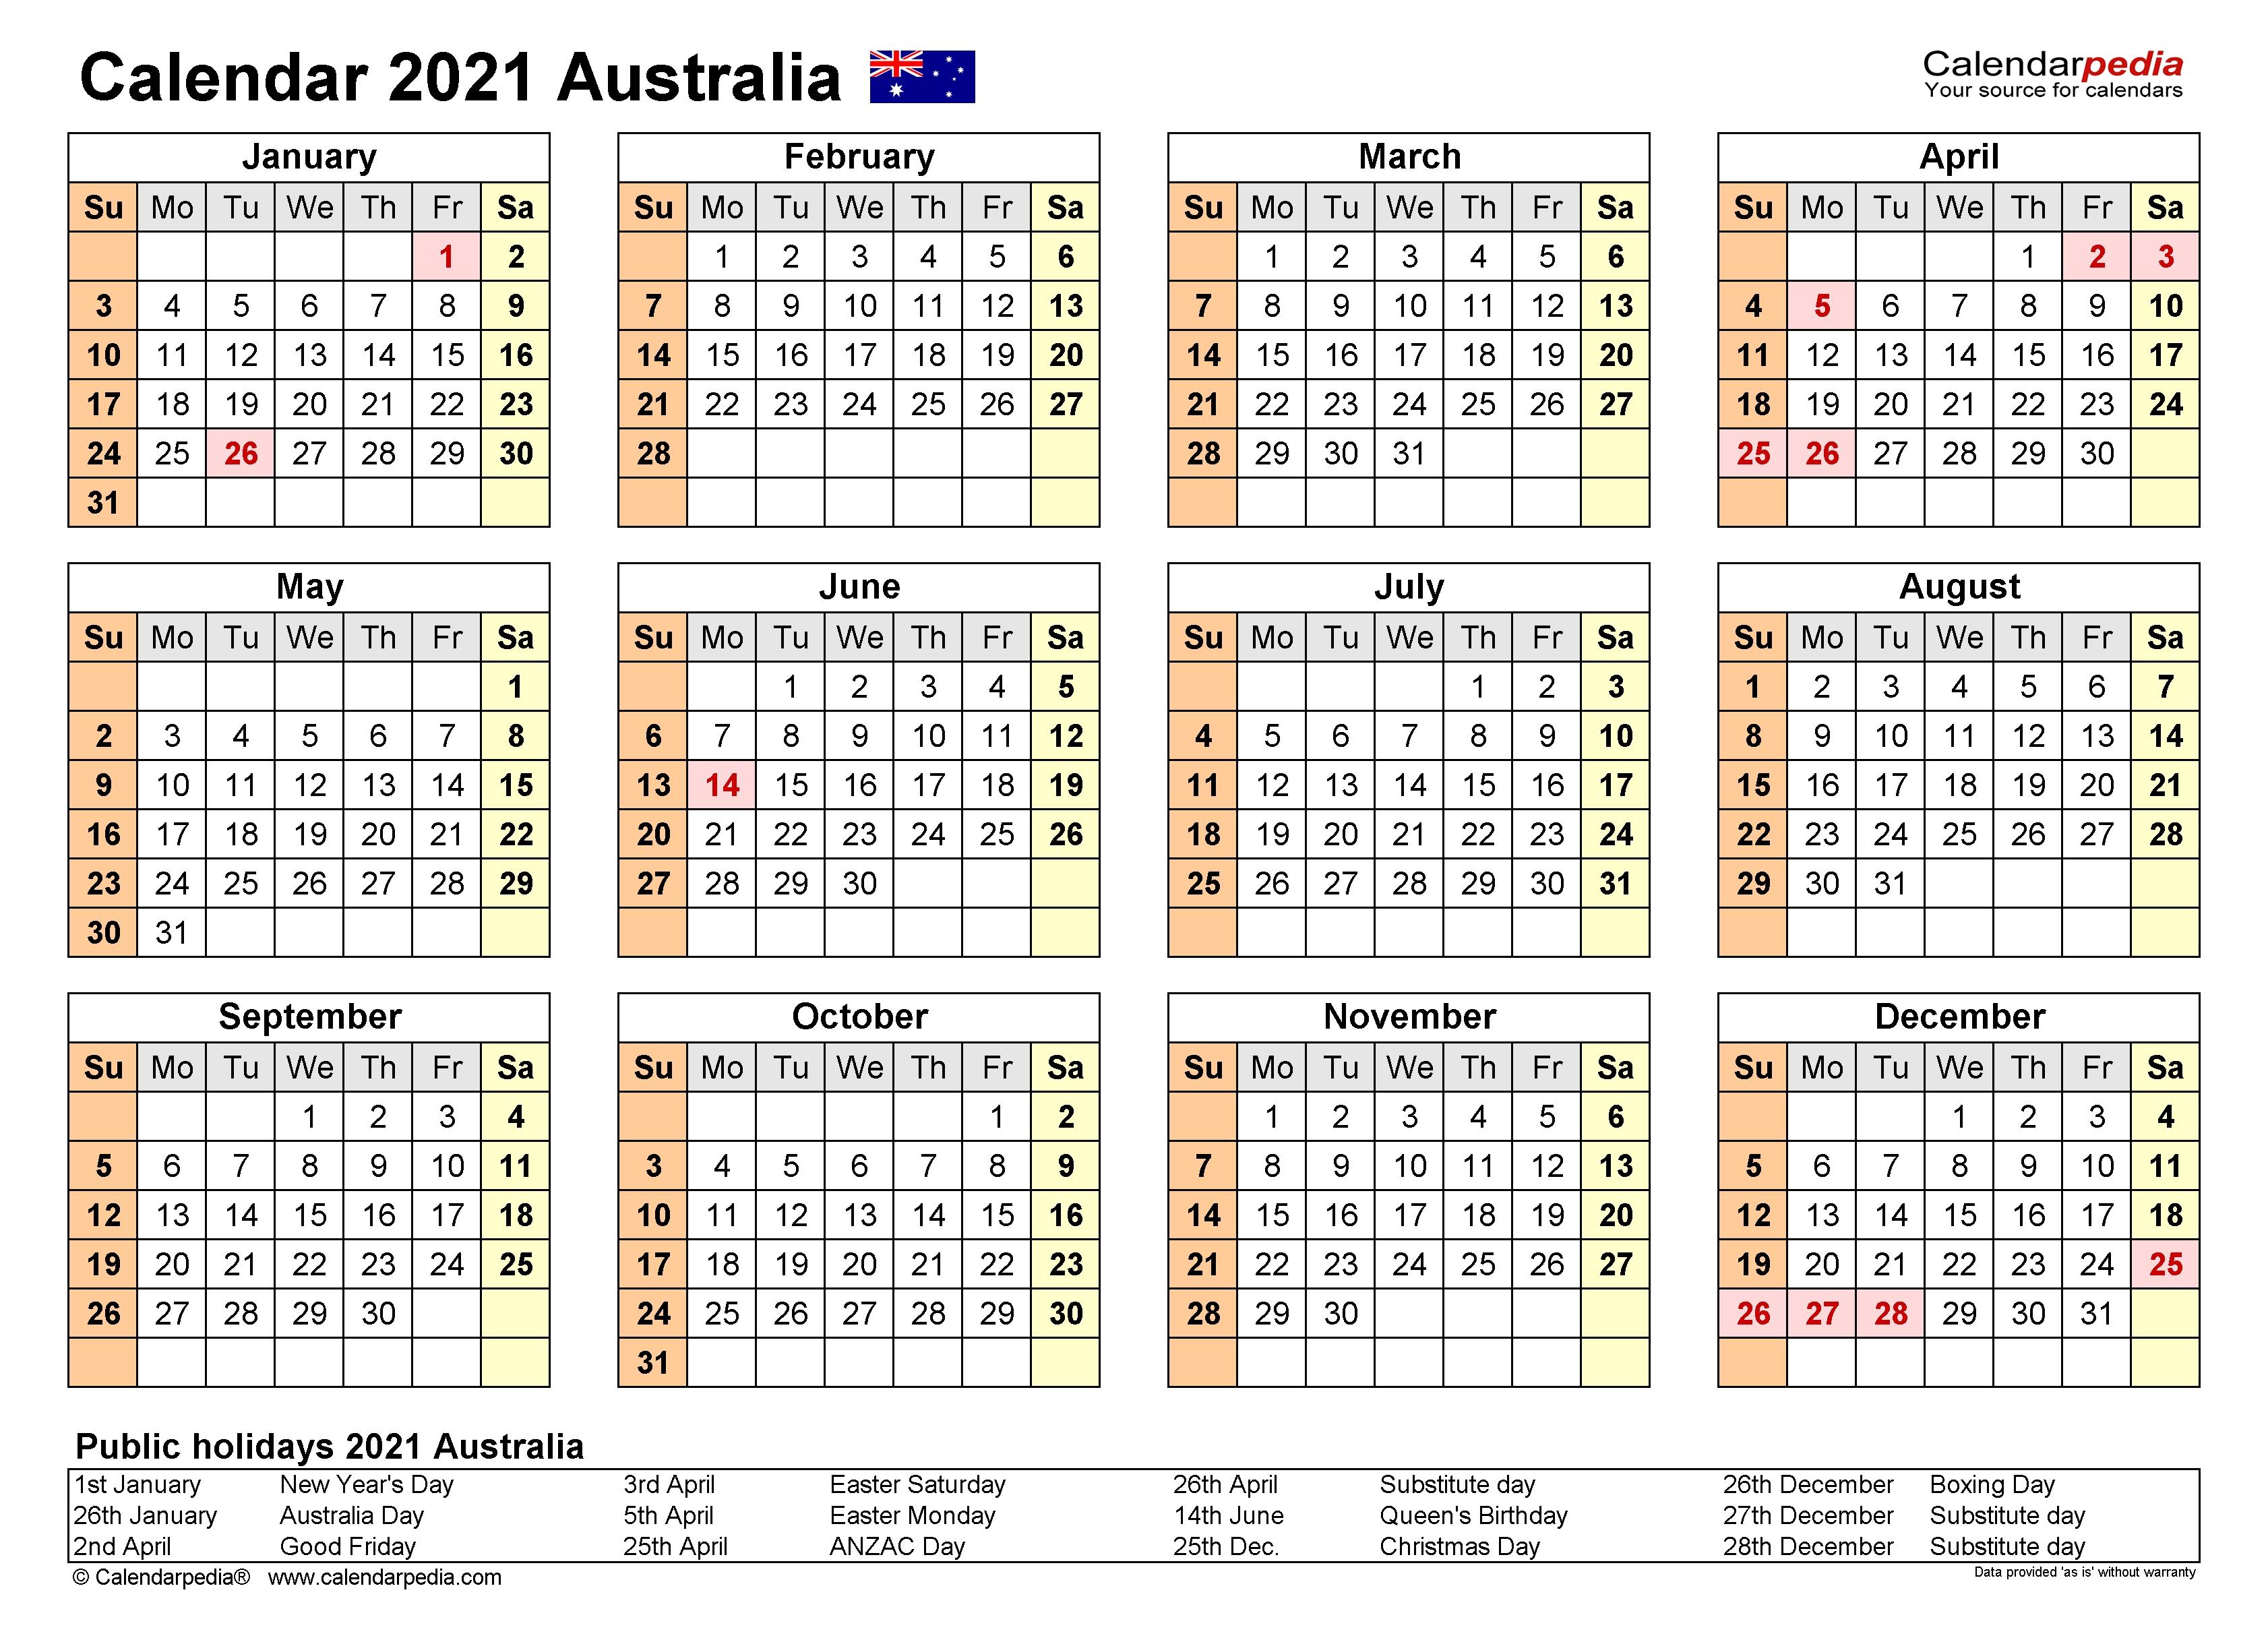 Australia Calendar 2021 - Free Printable Excel Templates  2021 Financial Calendar Australia